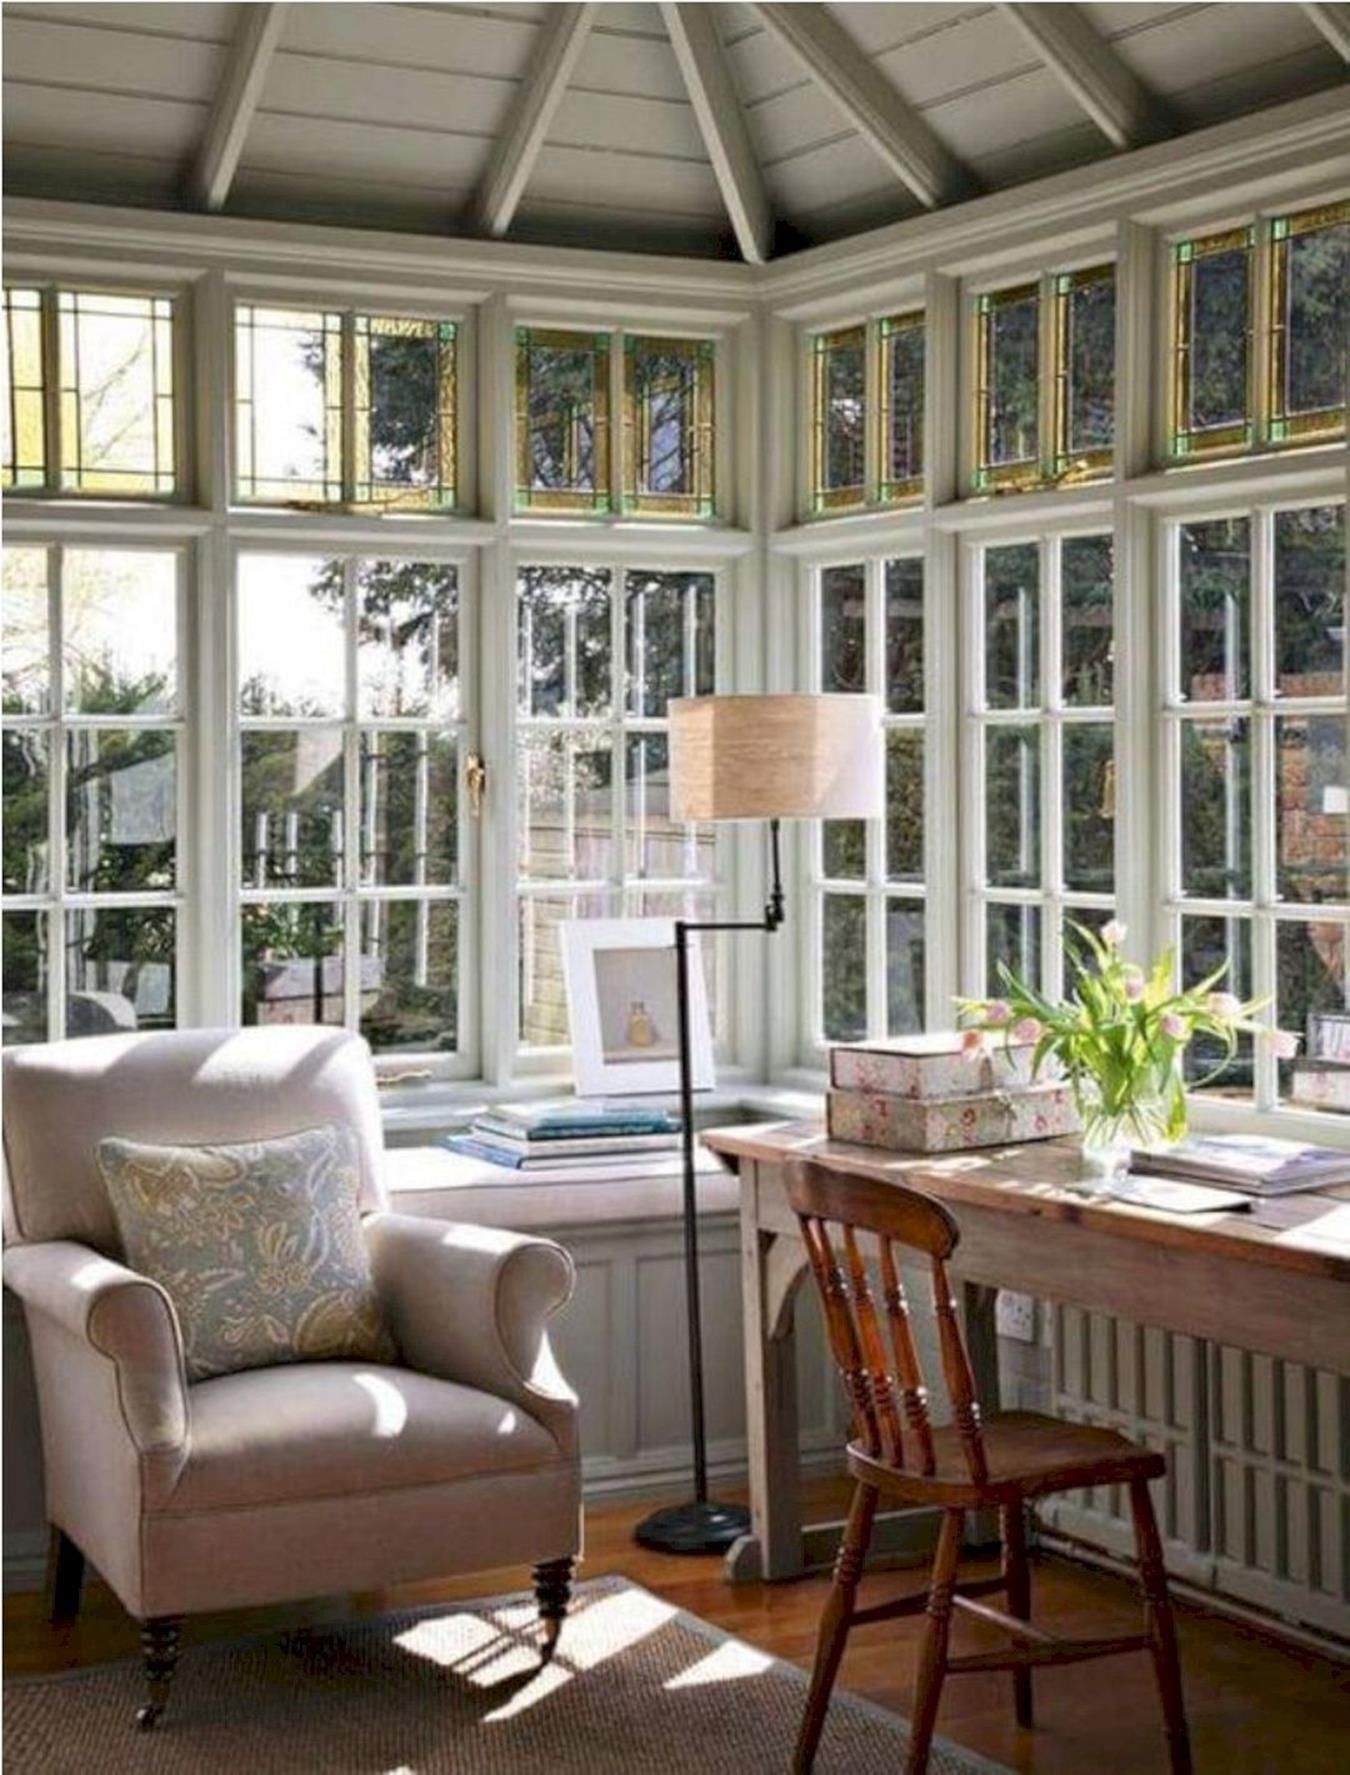 32 Amazing Small Conservatory Interior Design Ideas A Frame